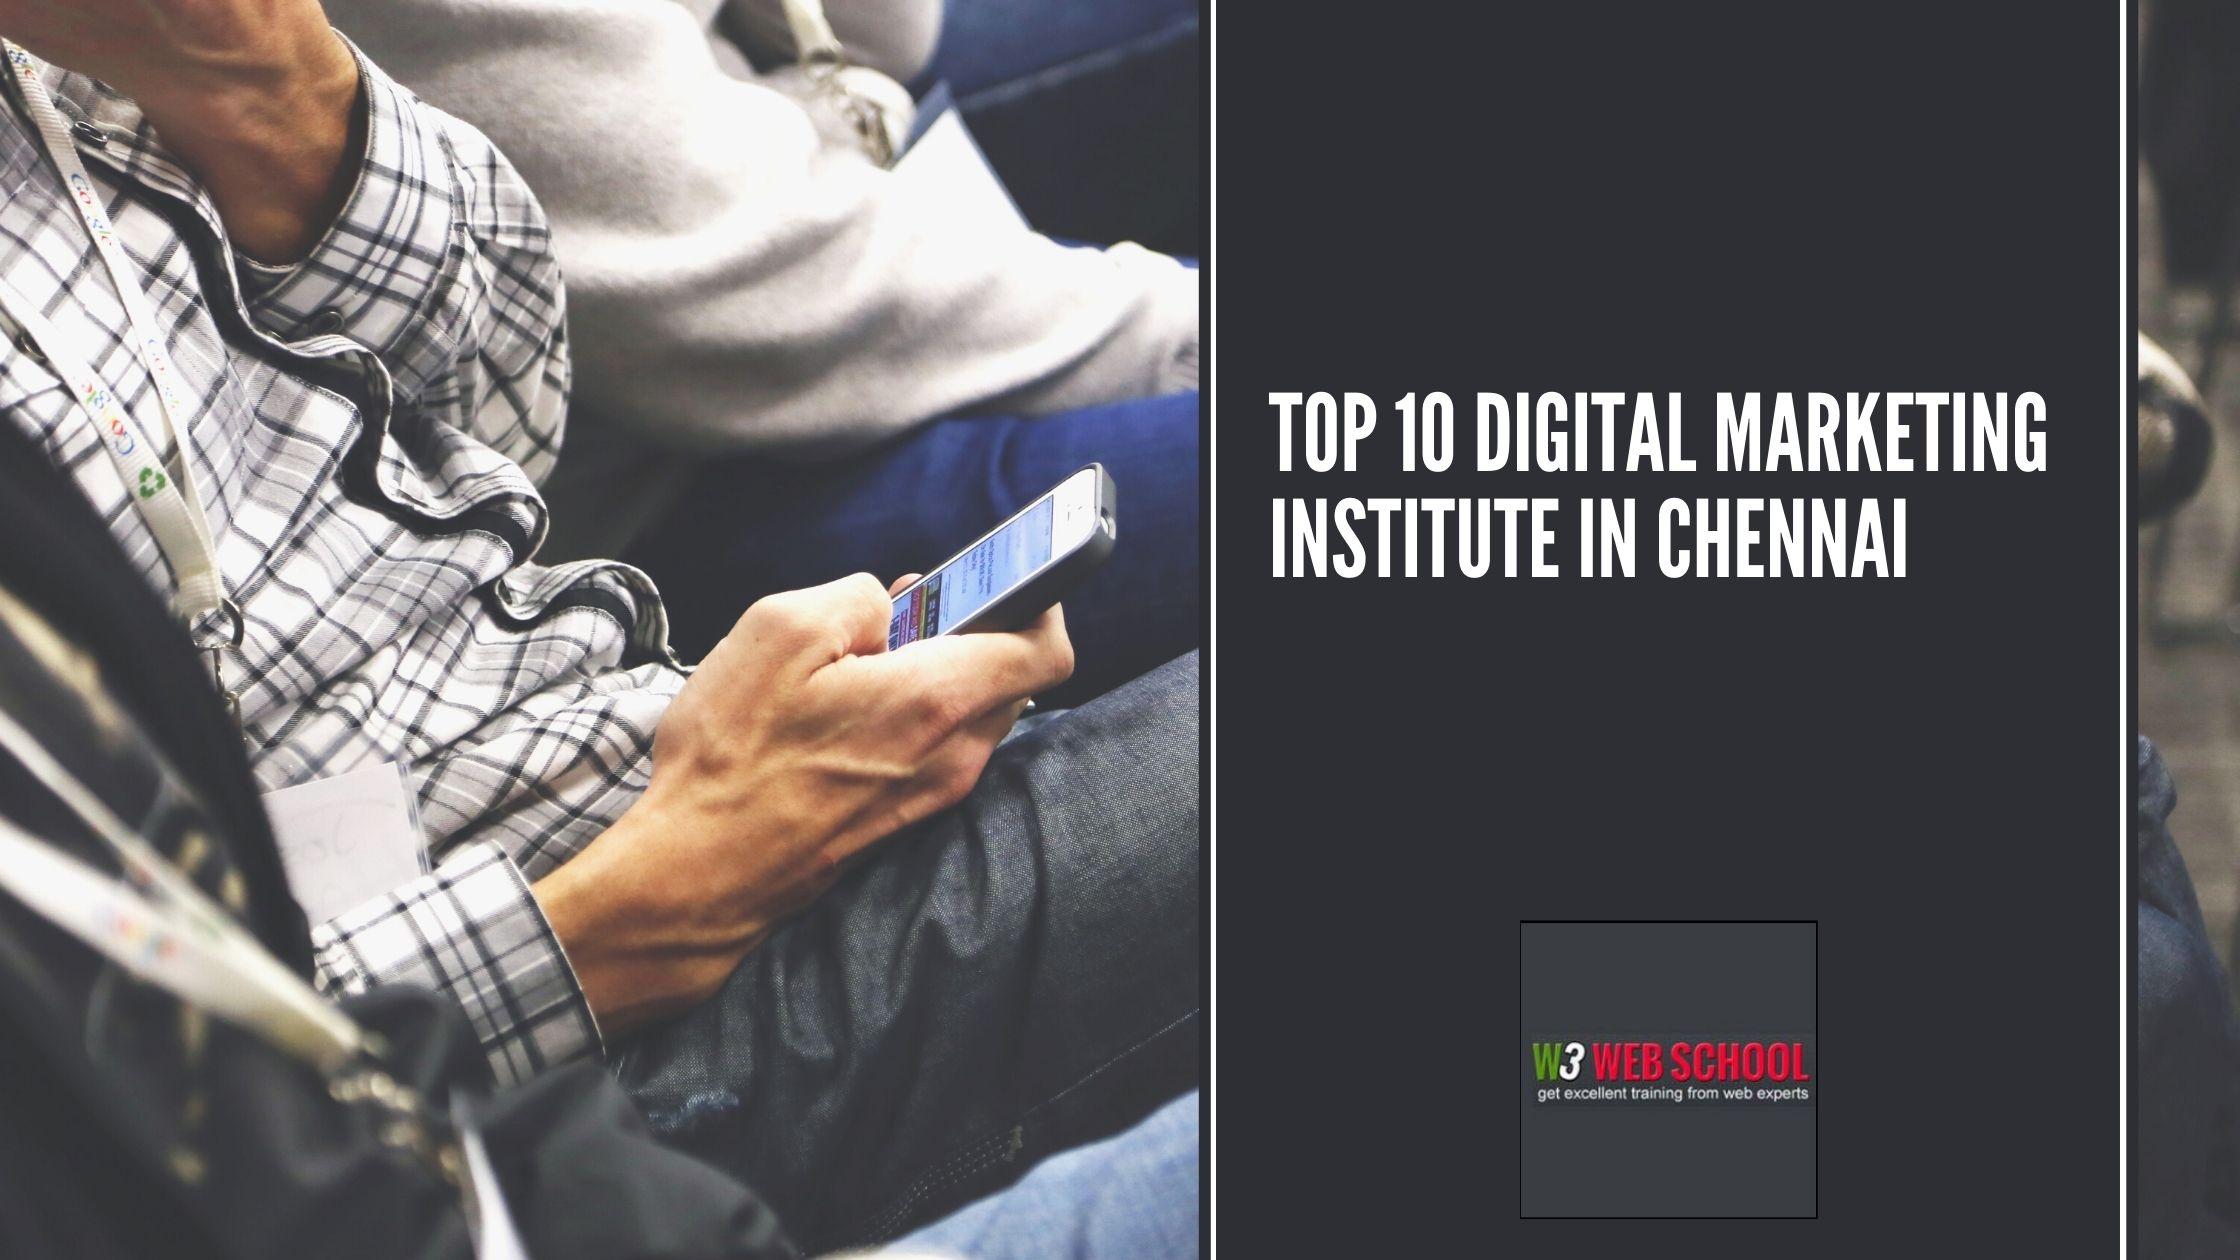 Top 10 Digital Marketing Institute in Chennai